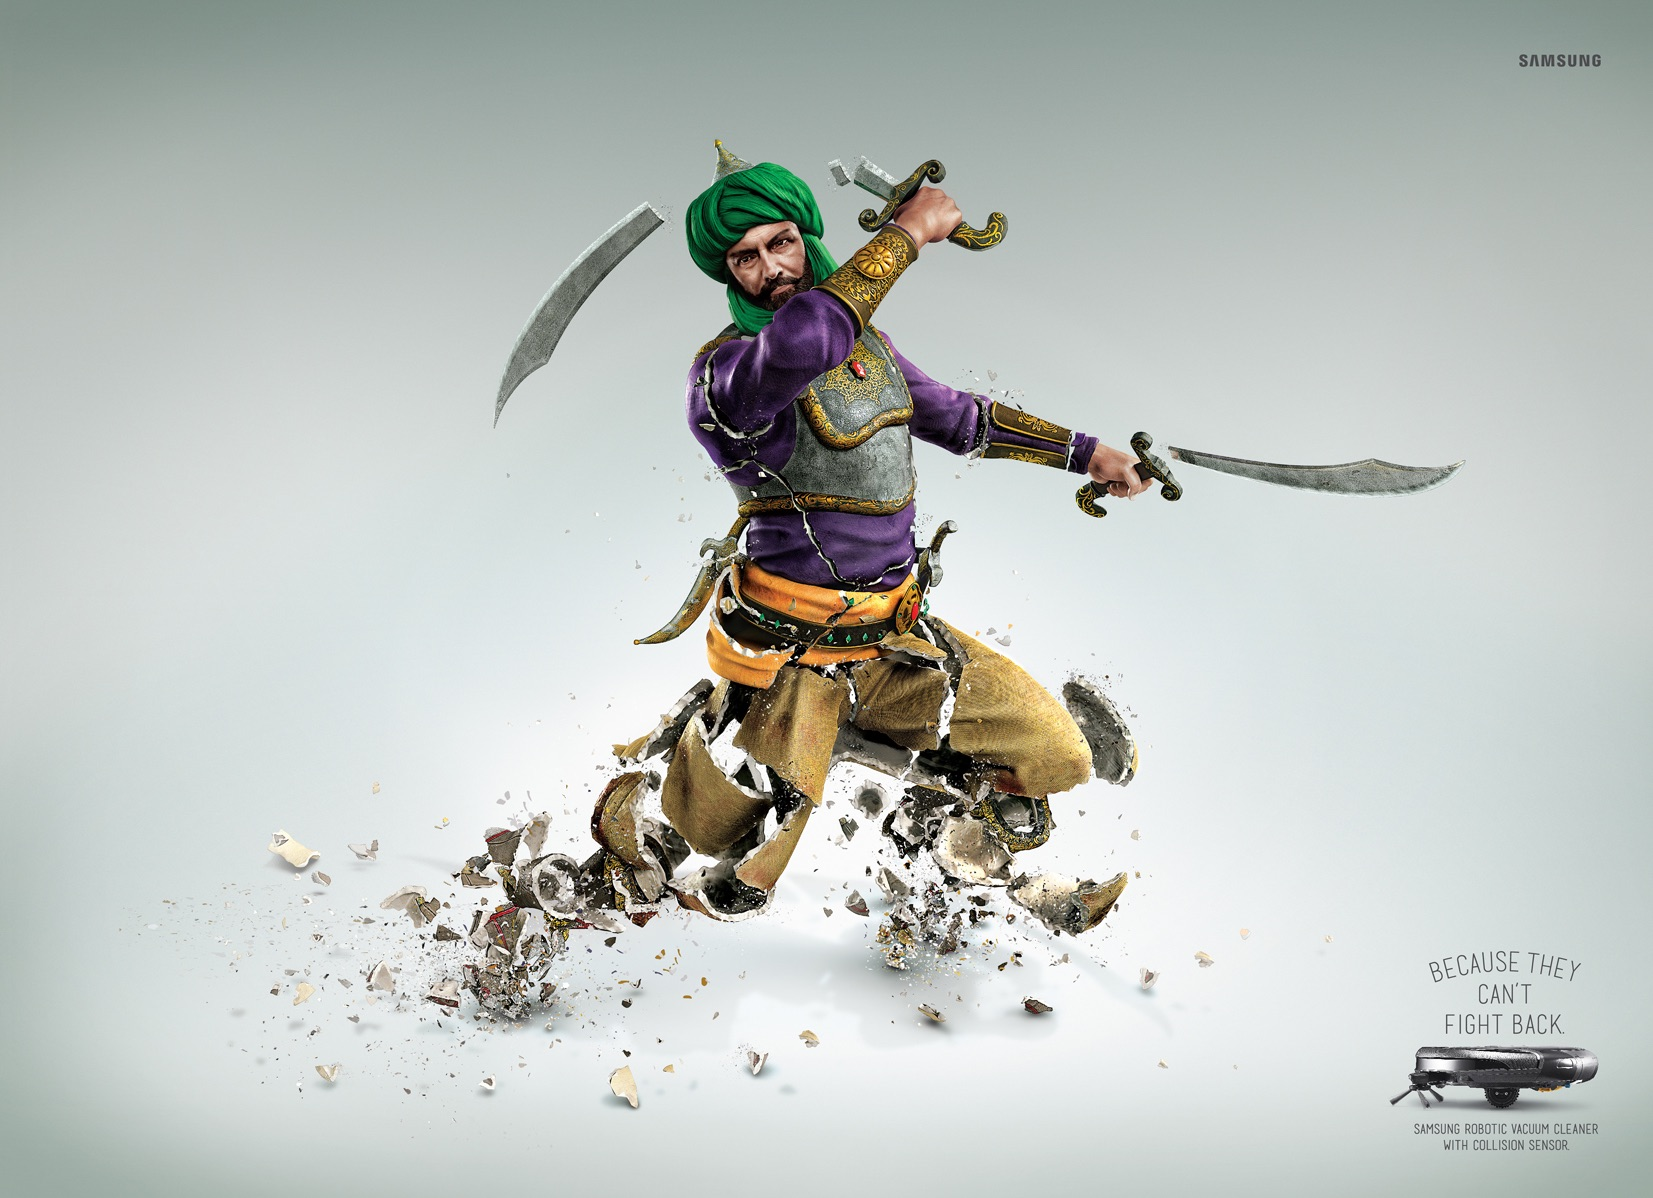 SAMSUNG - ペルシャ人兵士